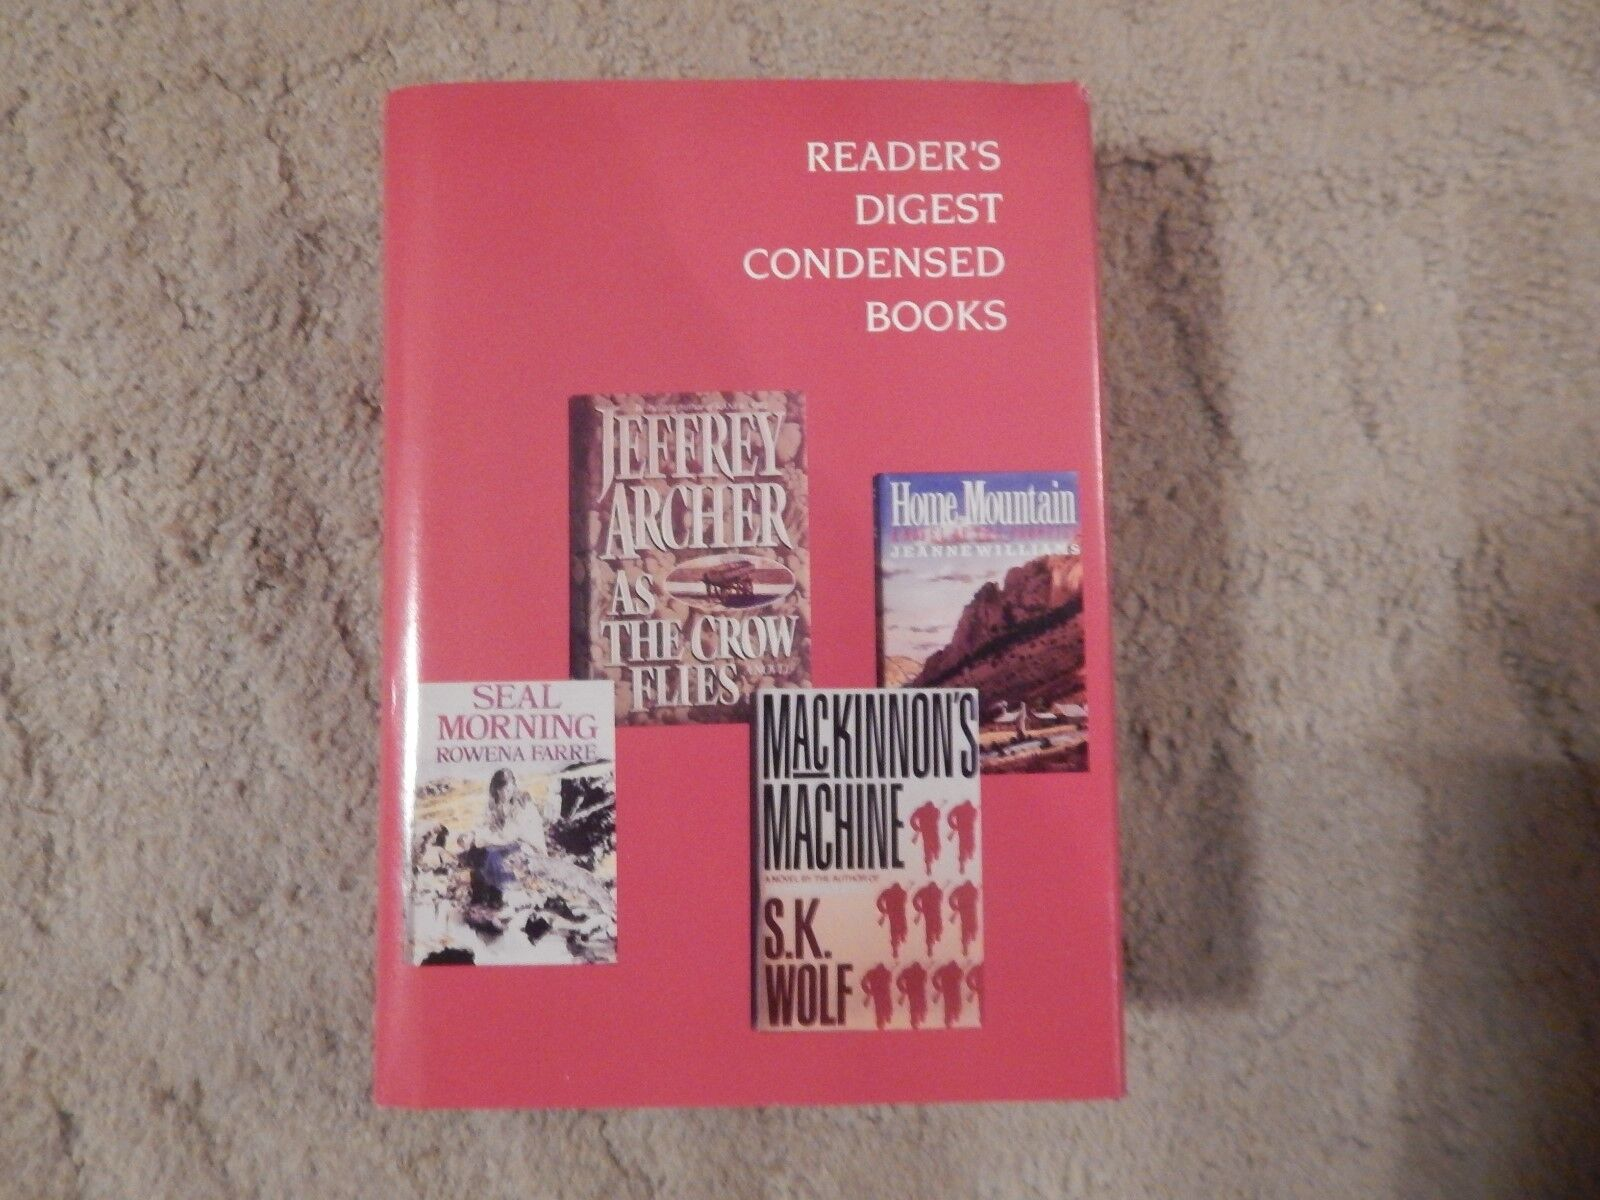 READER S DIGEST CONDENSED BOOKS - VOLUME 4 1991 HARDCOVER  - $0.05